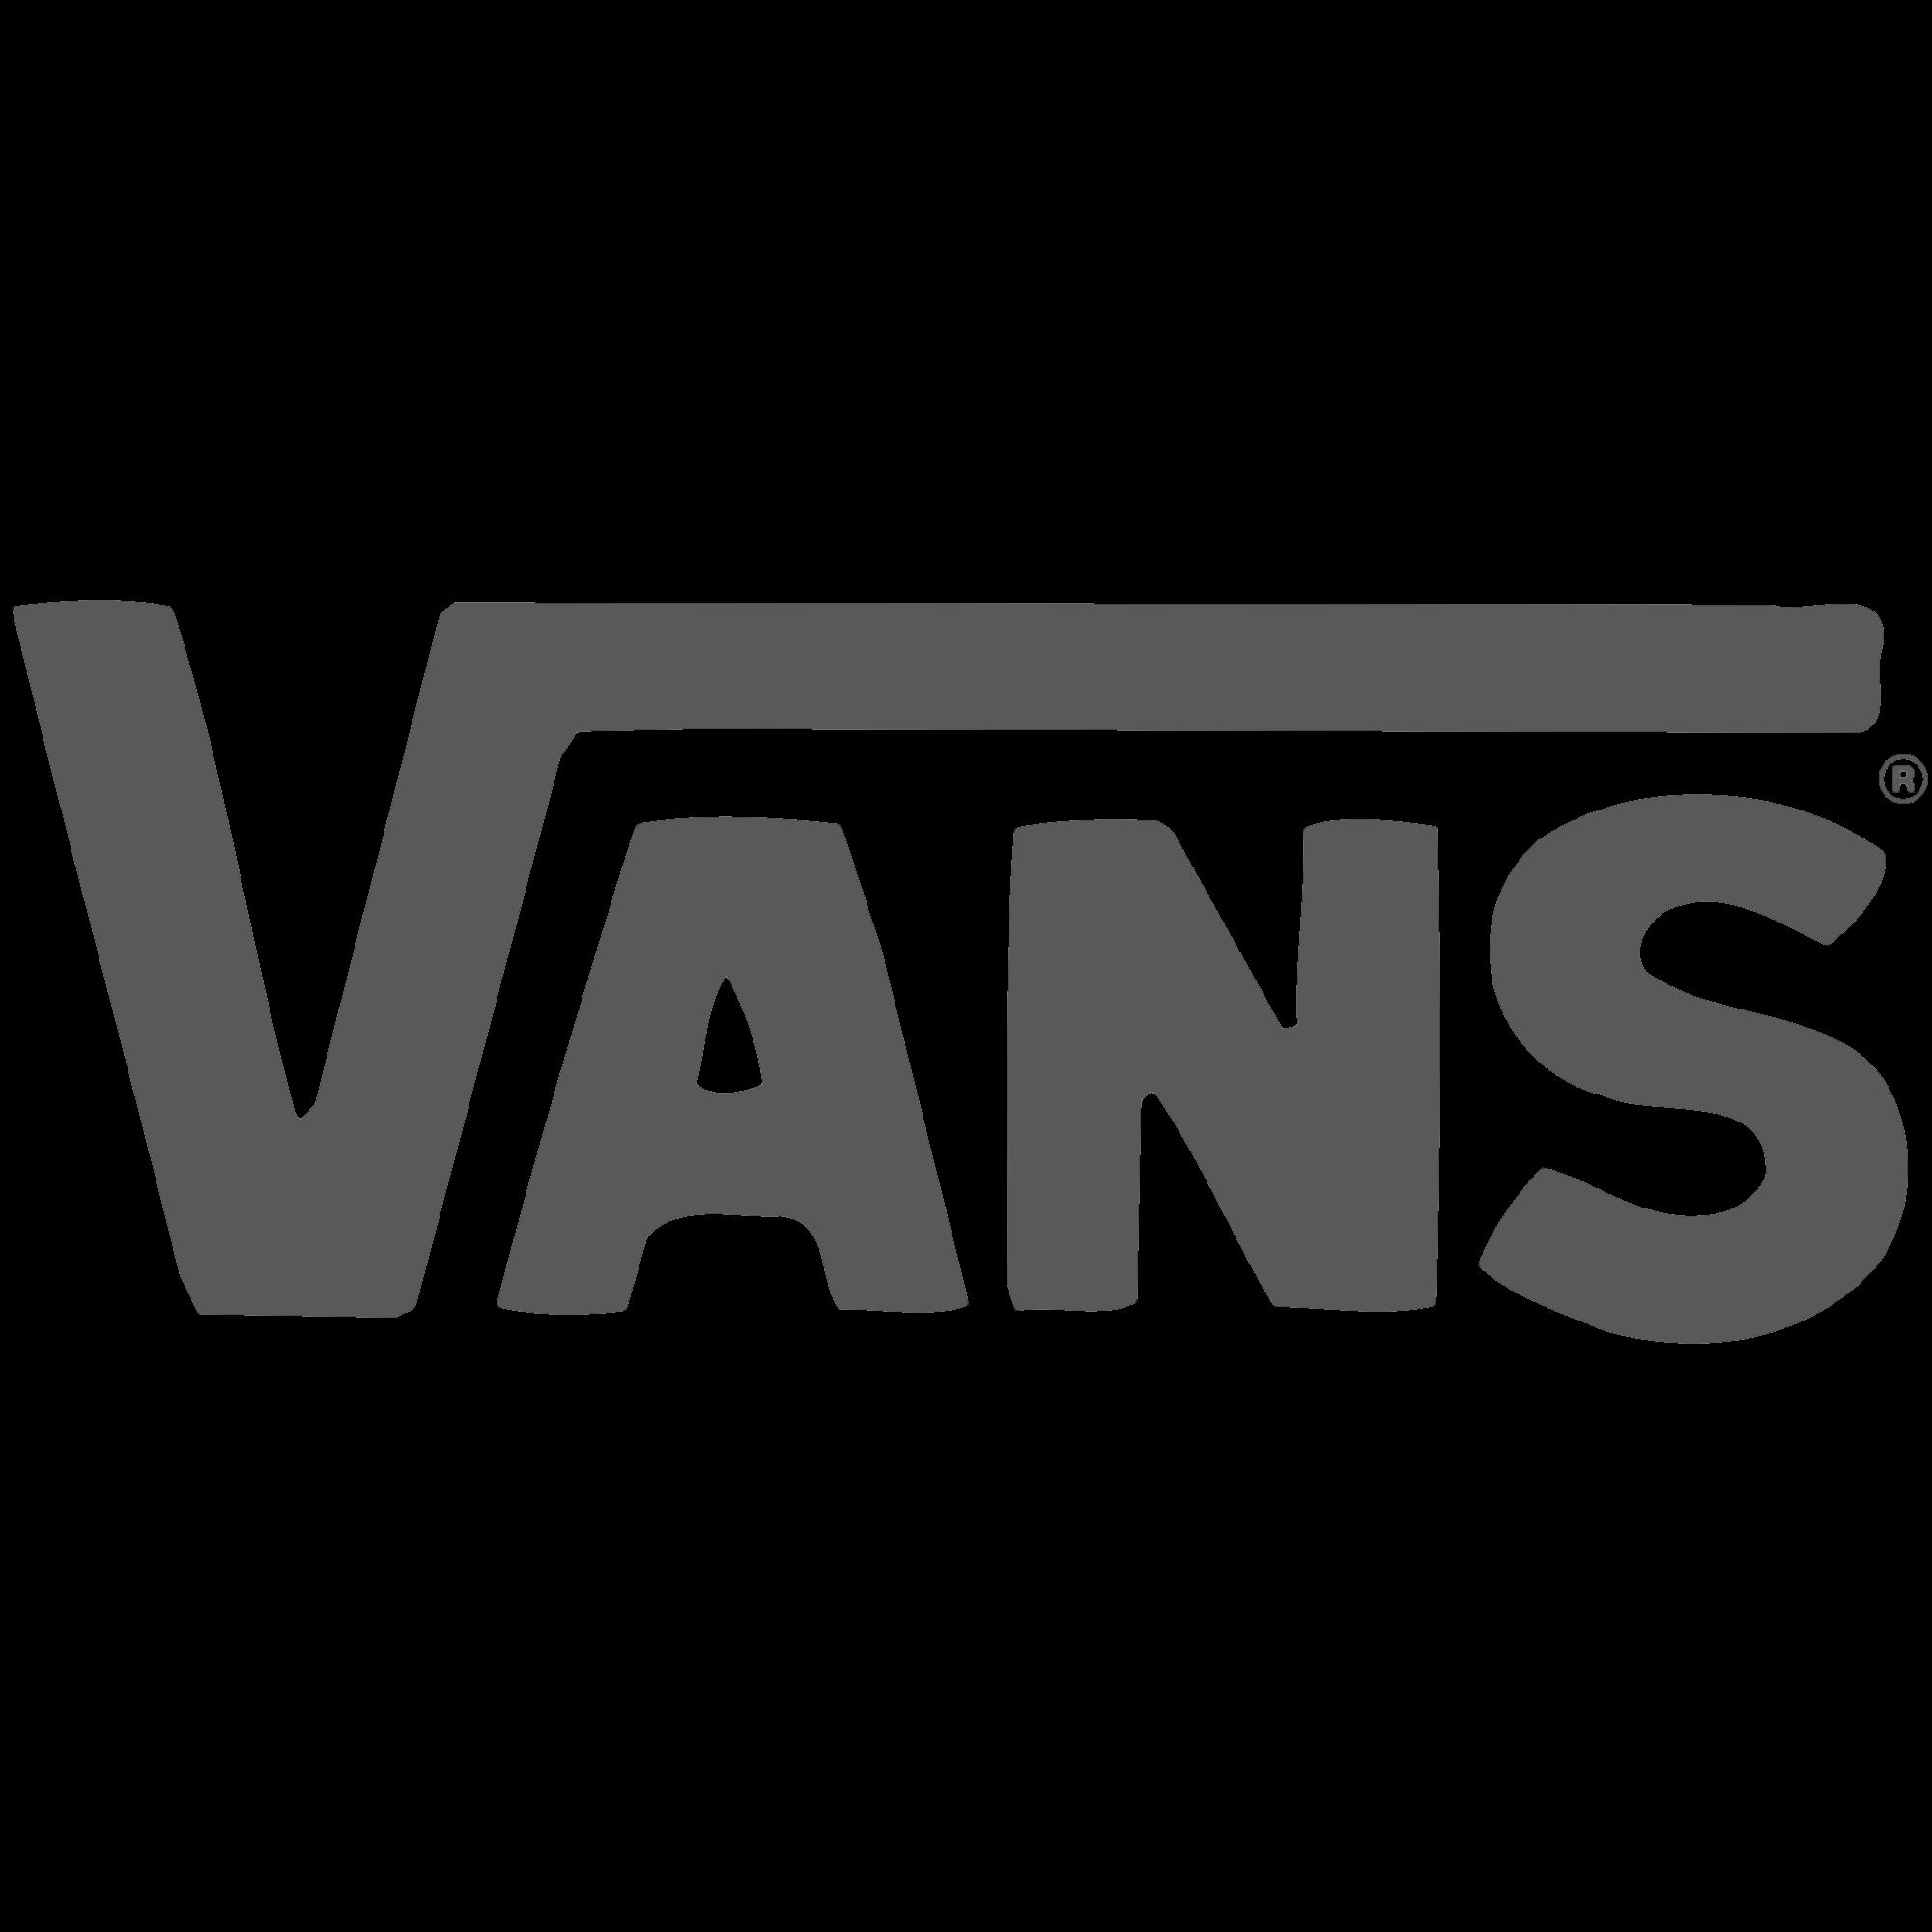 2000px-Vans-logo.png